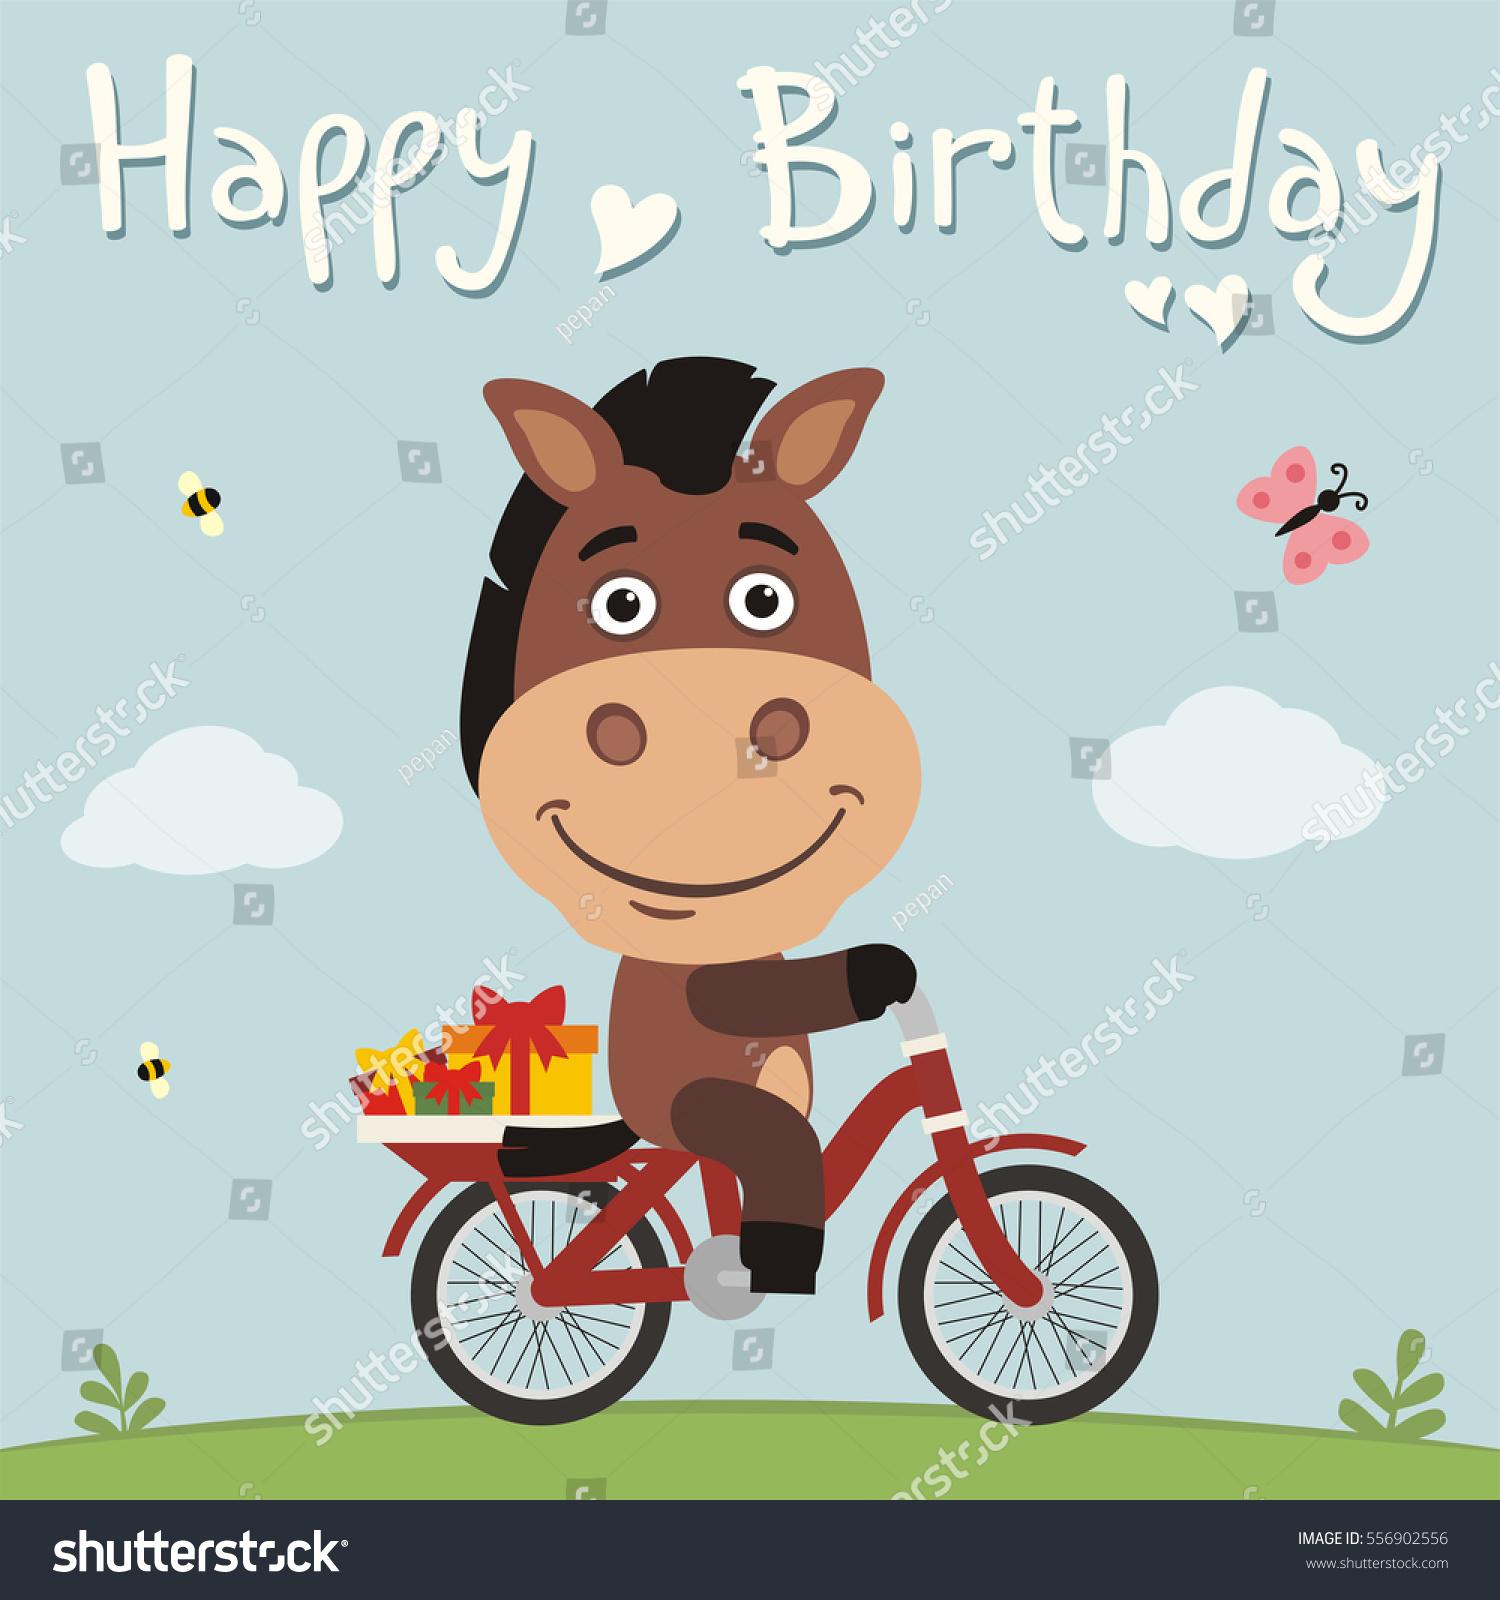 Happy Birthday Funny Horse On Bike Stock Vector Royalty Free 556902556